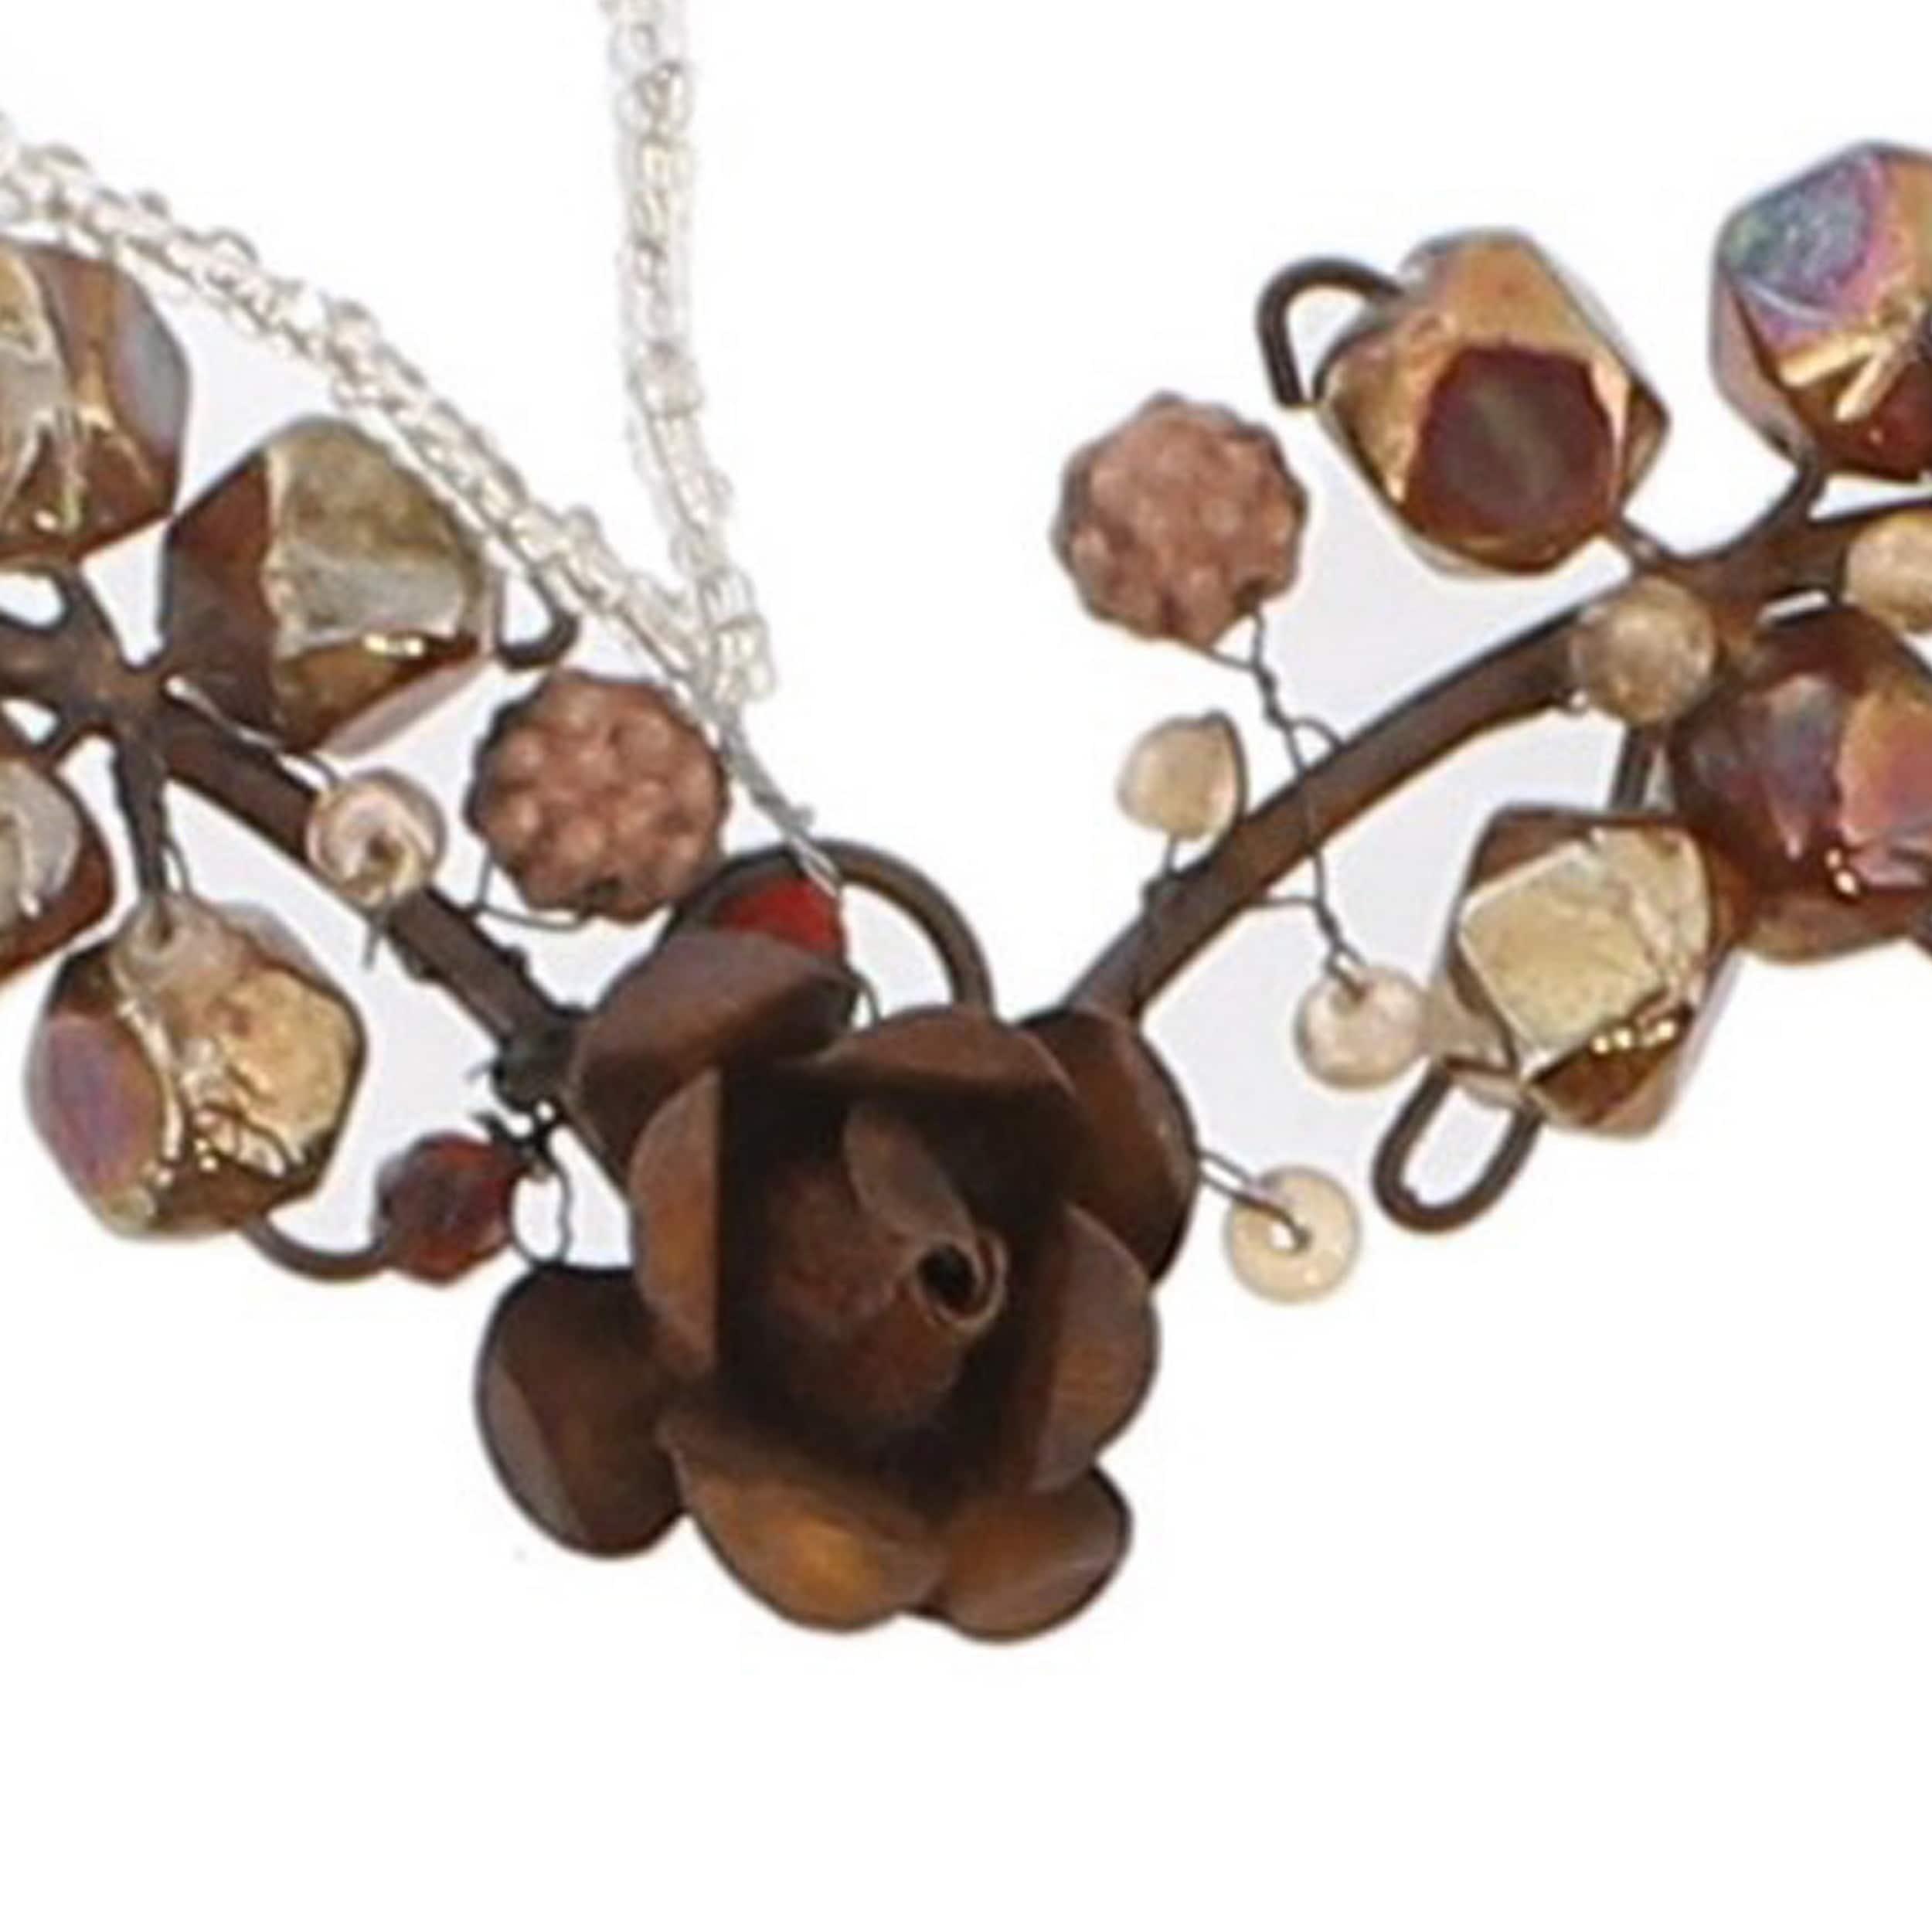 Beaded Heart Design Metal Wall Decor Large Rustic Bronze On Sale Overstock 32179791